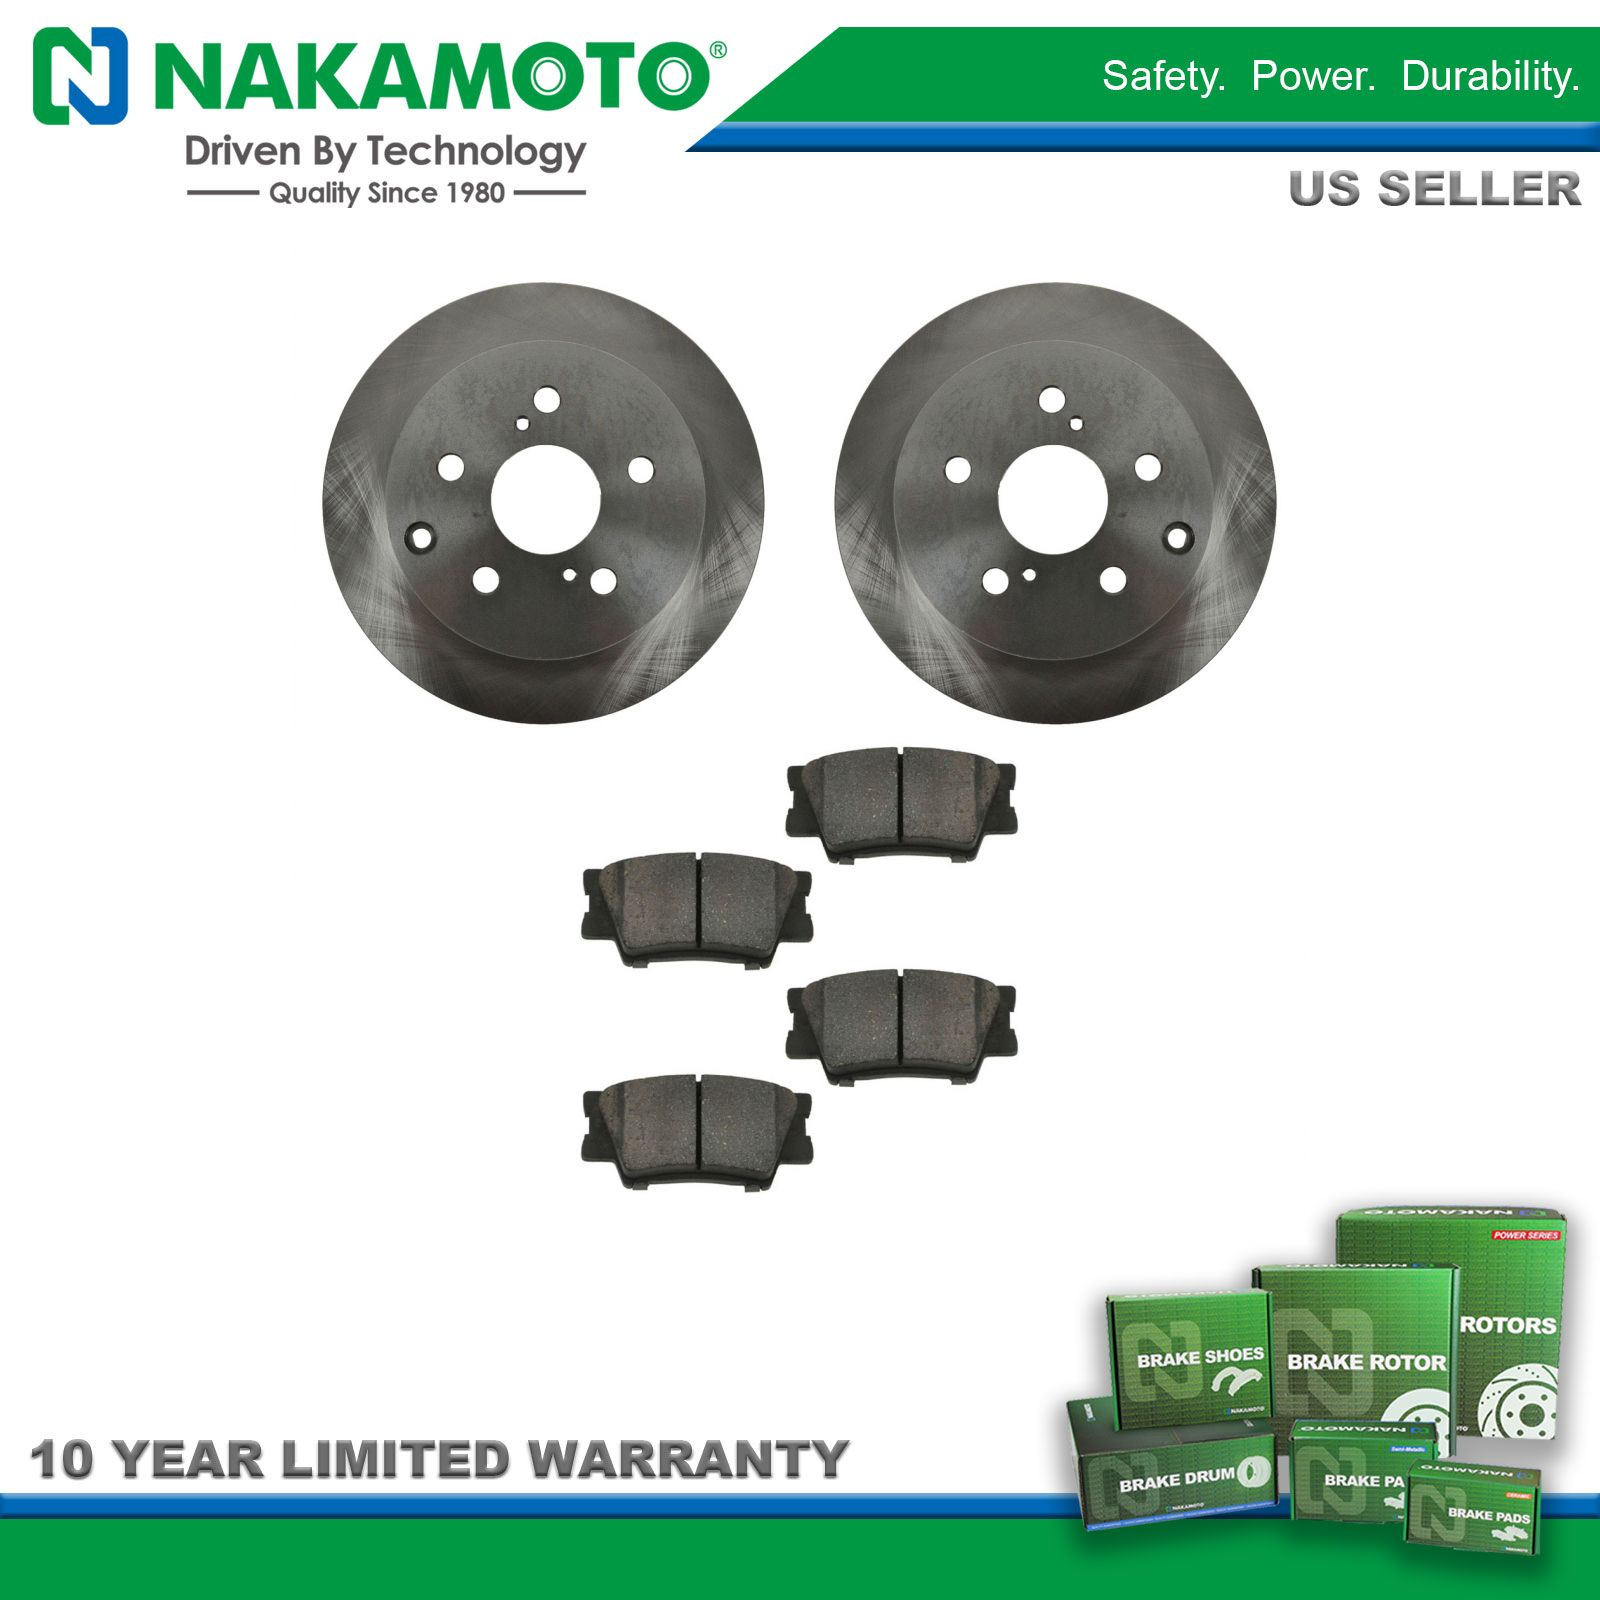 Nakamoto Front /& Rear Premium Posi Ceramic Disc Brake Pad /& Rotor Kit for Toyota